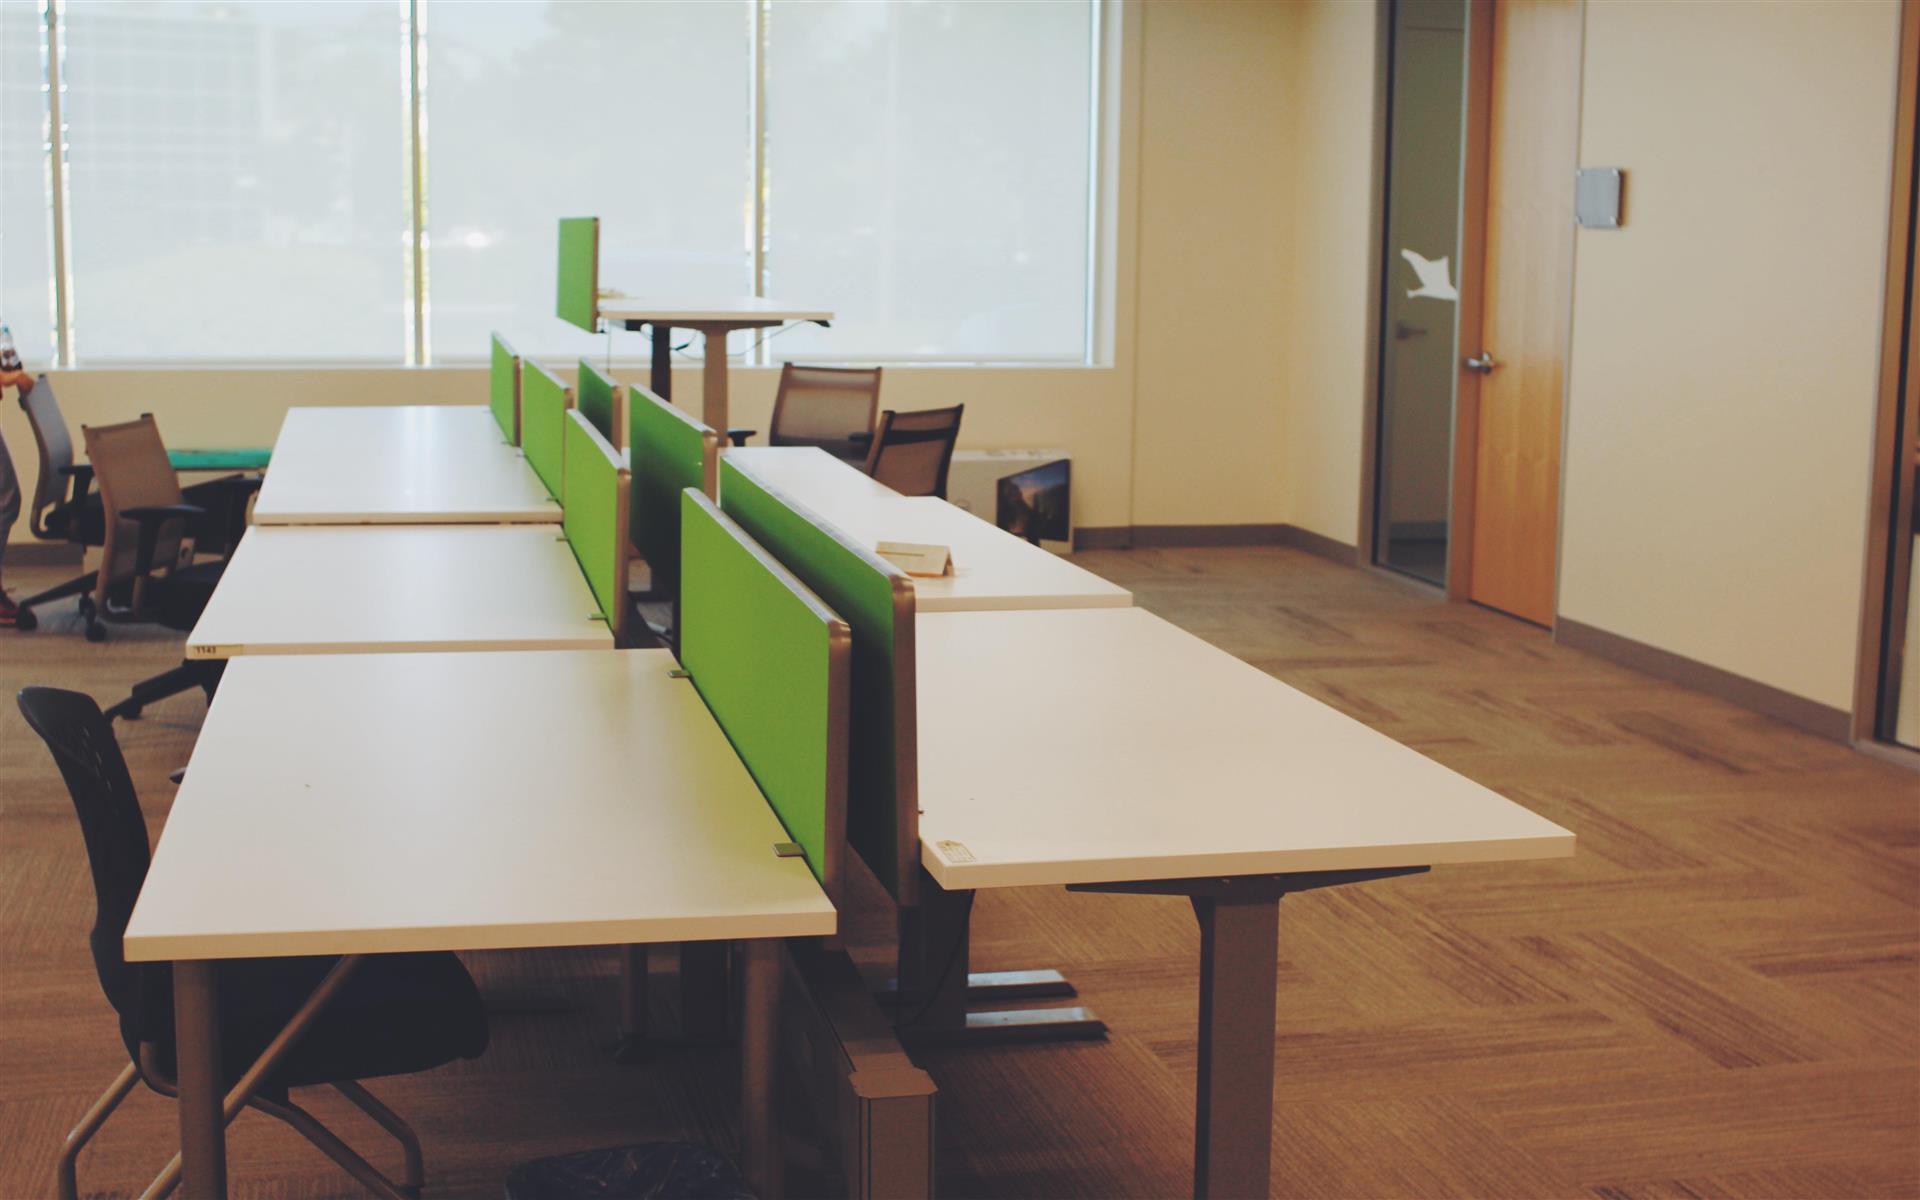 ZGC Innovation Center - Dedicated Desk-Adjustable